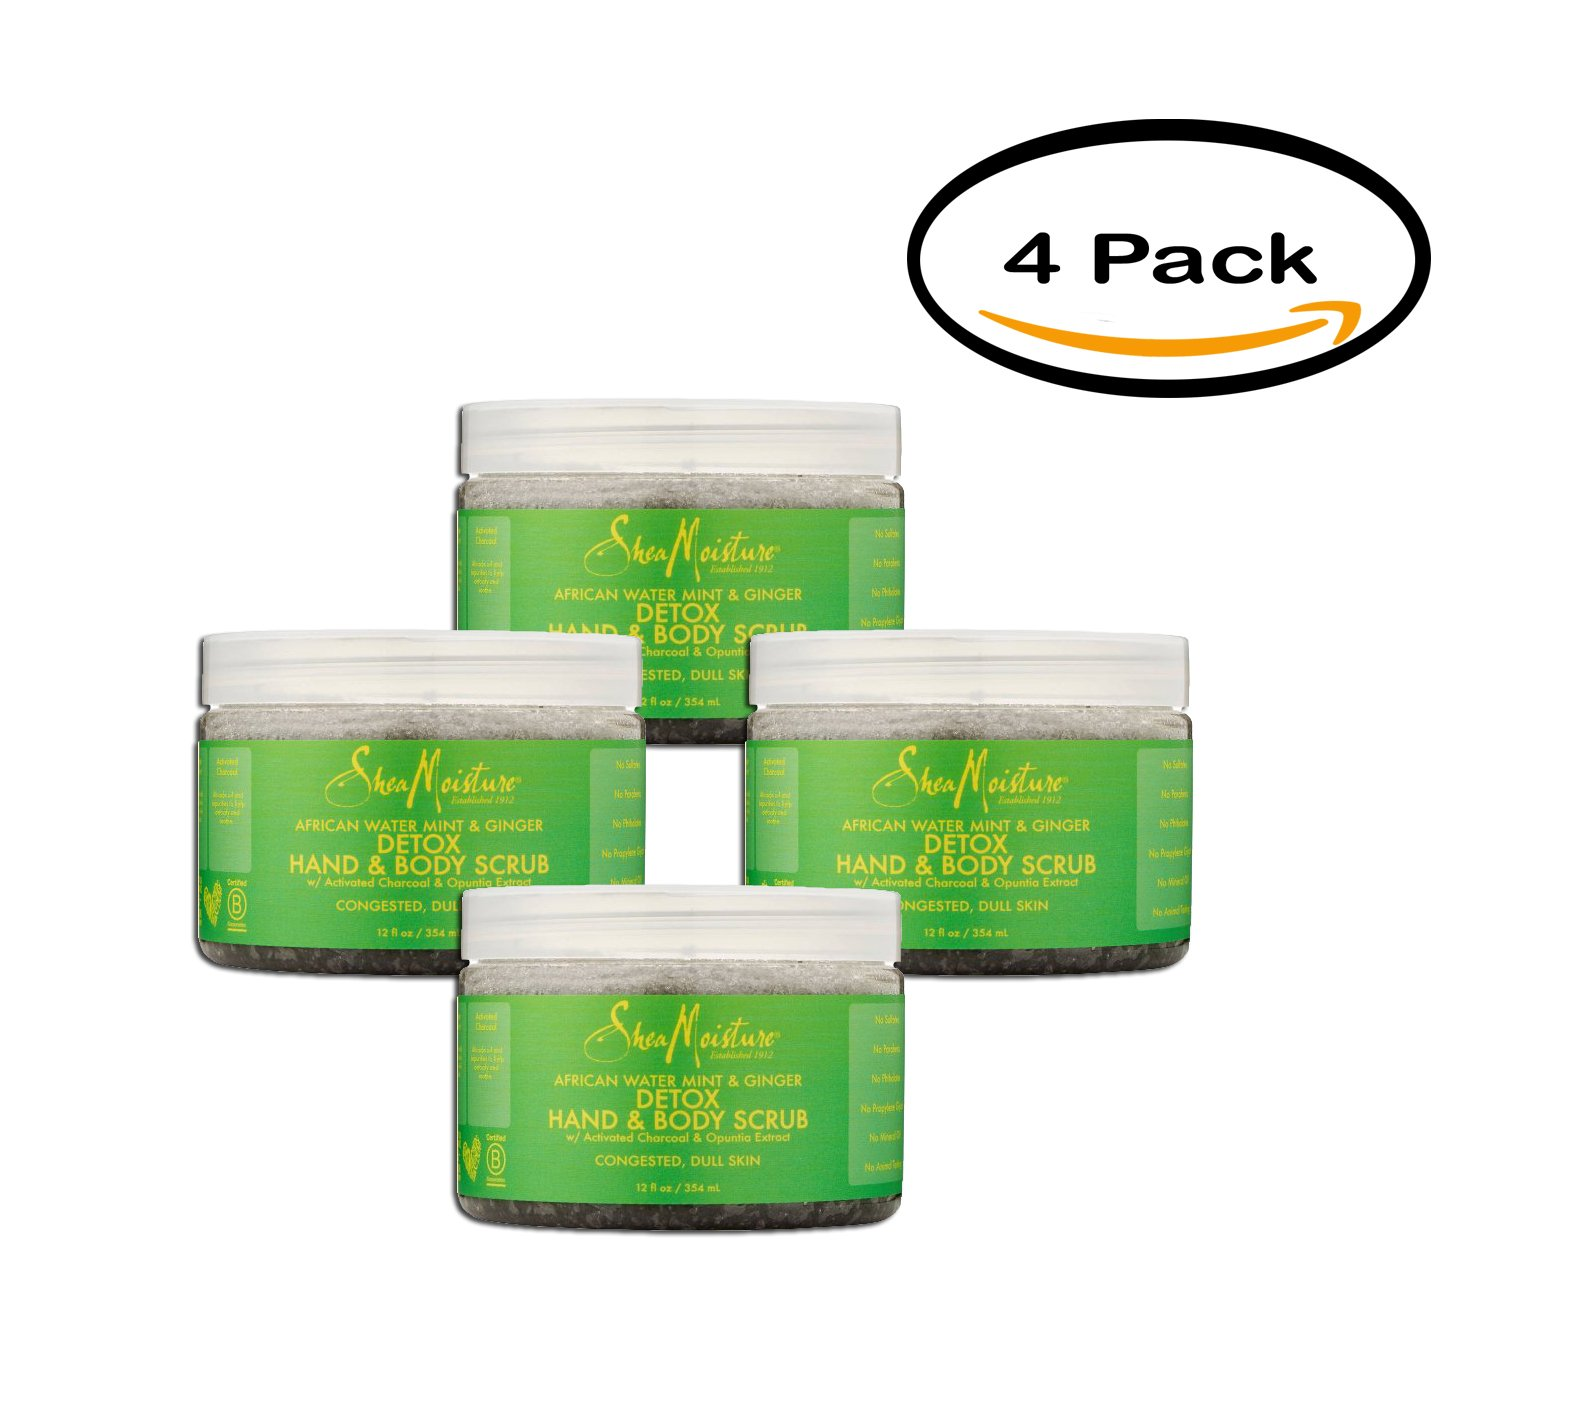 PACK OF 4 - SheaMoisture African Water Hand & Body Scrub, Mint & Ginger, 12 fl oz